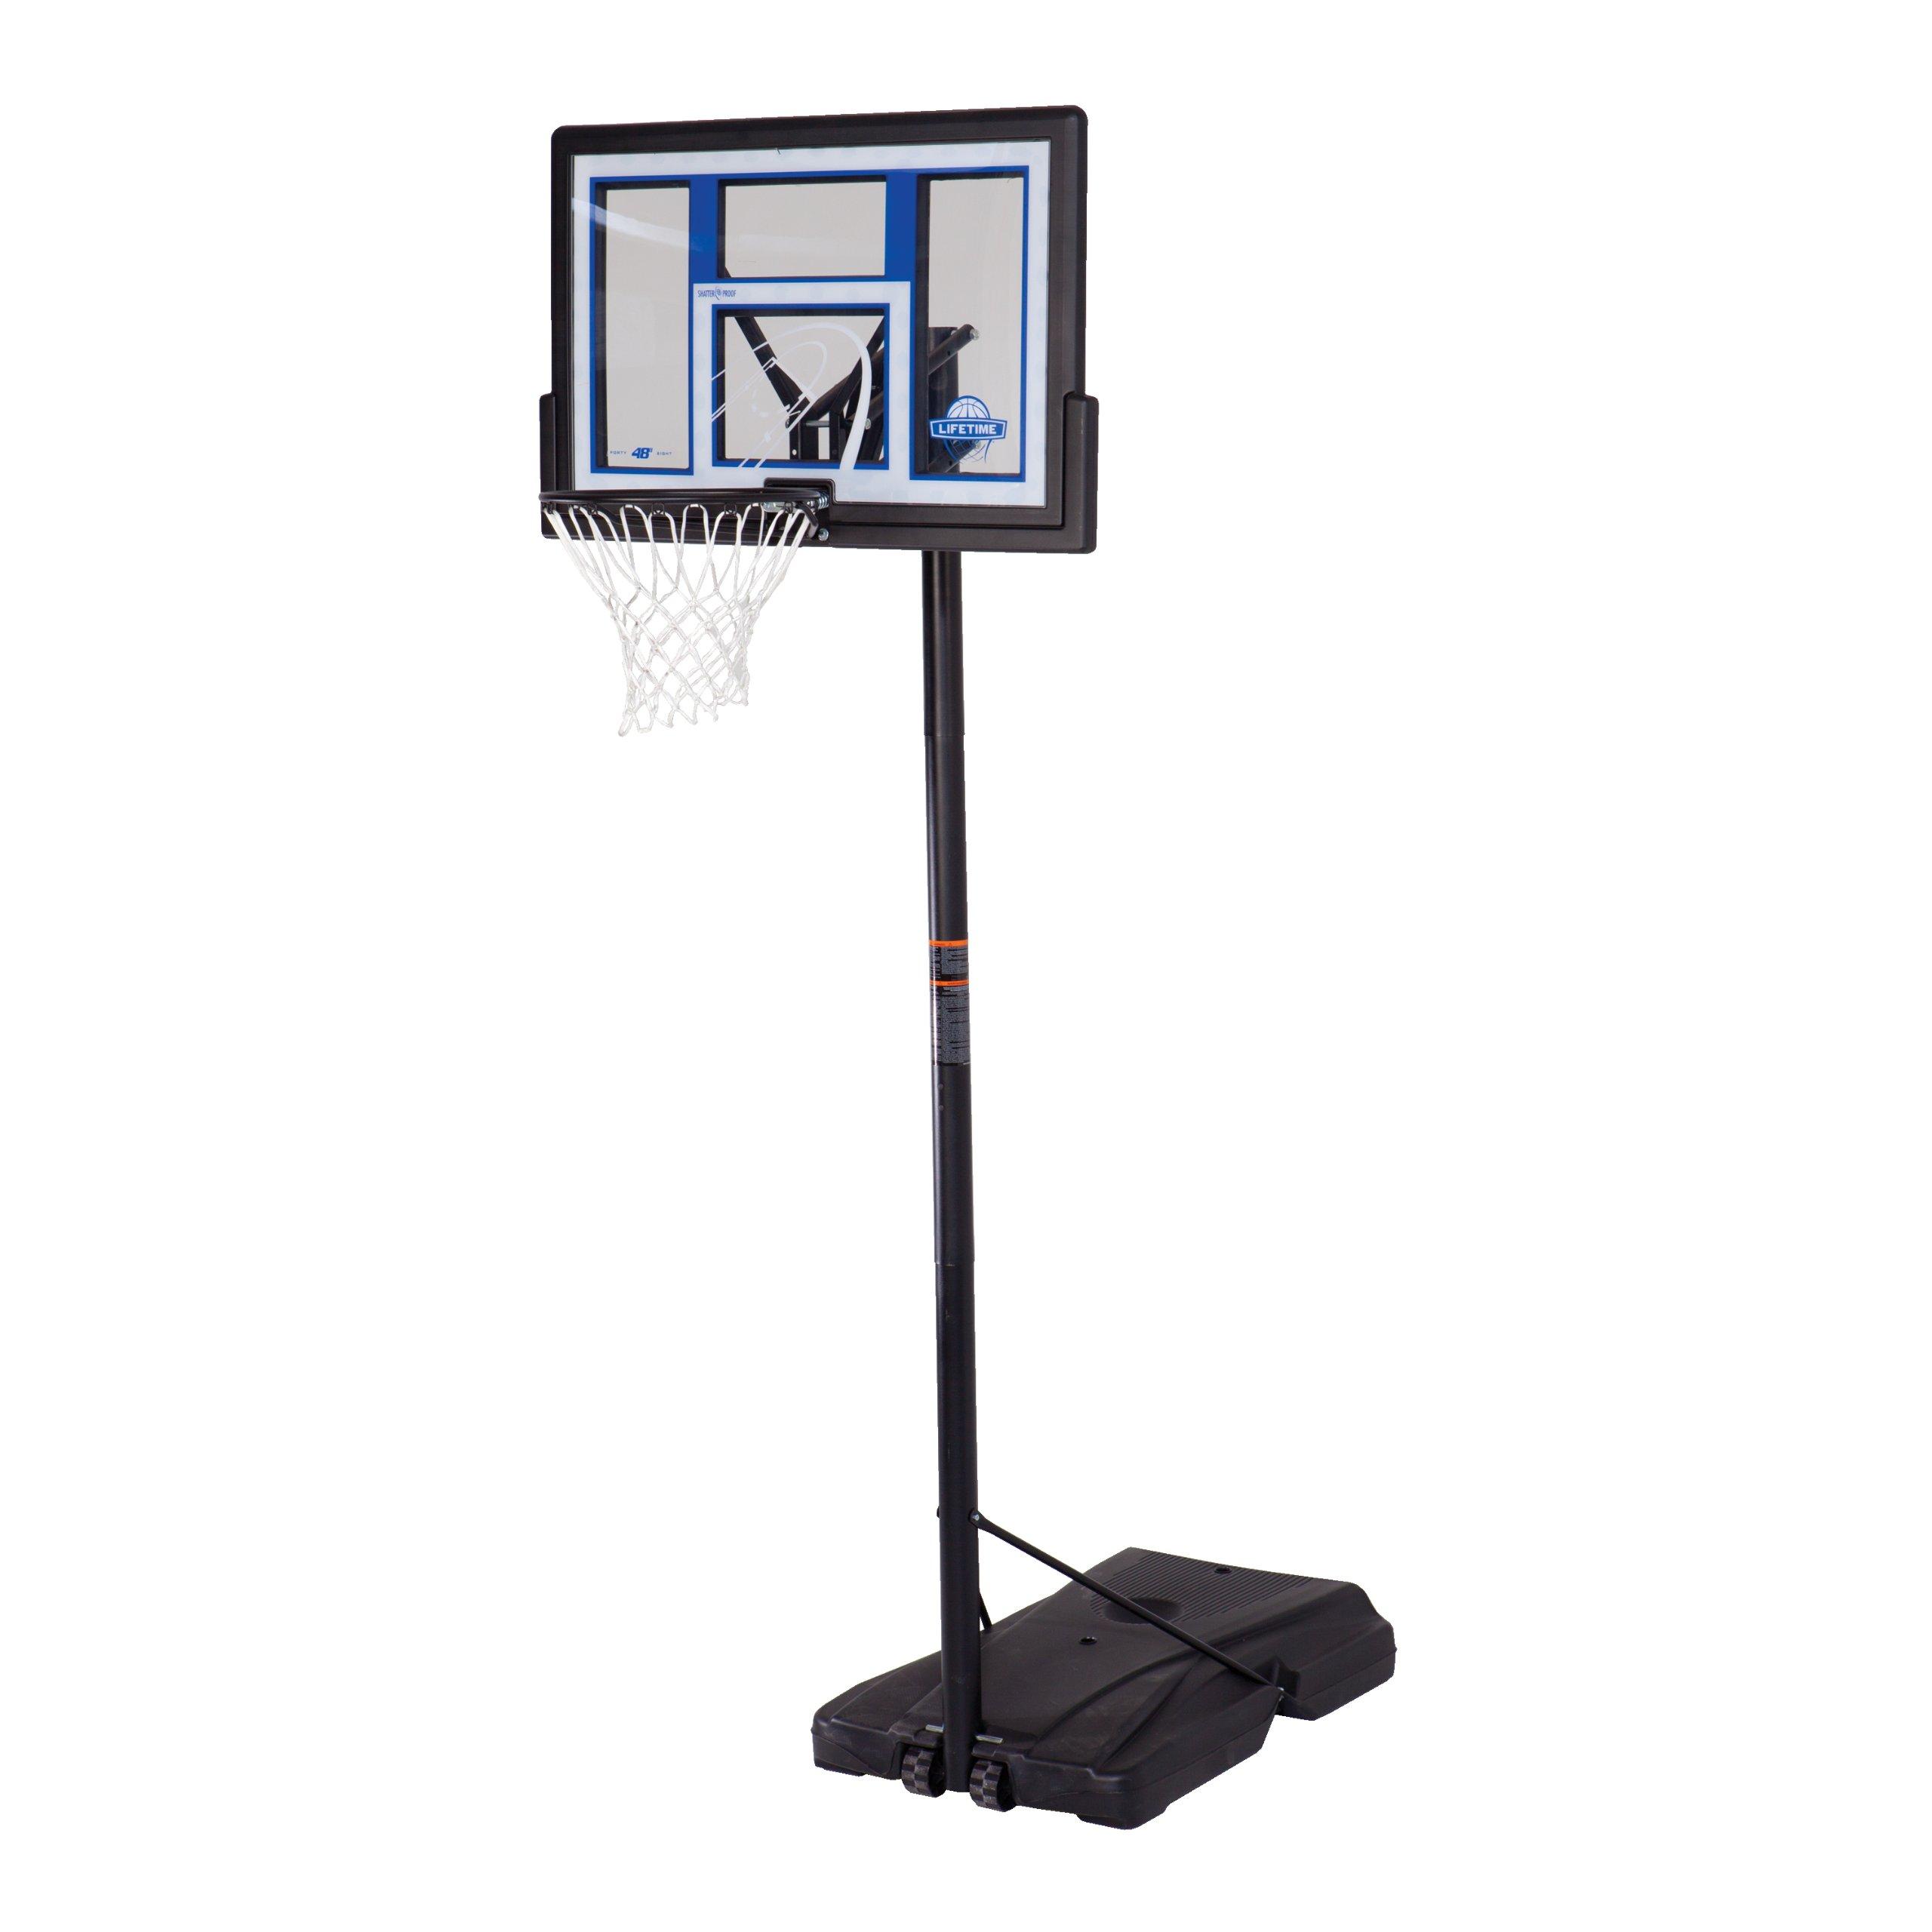 Lifetime 1479 Courtside Height Adjustable Portable Basketball System, 48 Inch Shatterproof Backboard